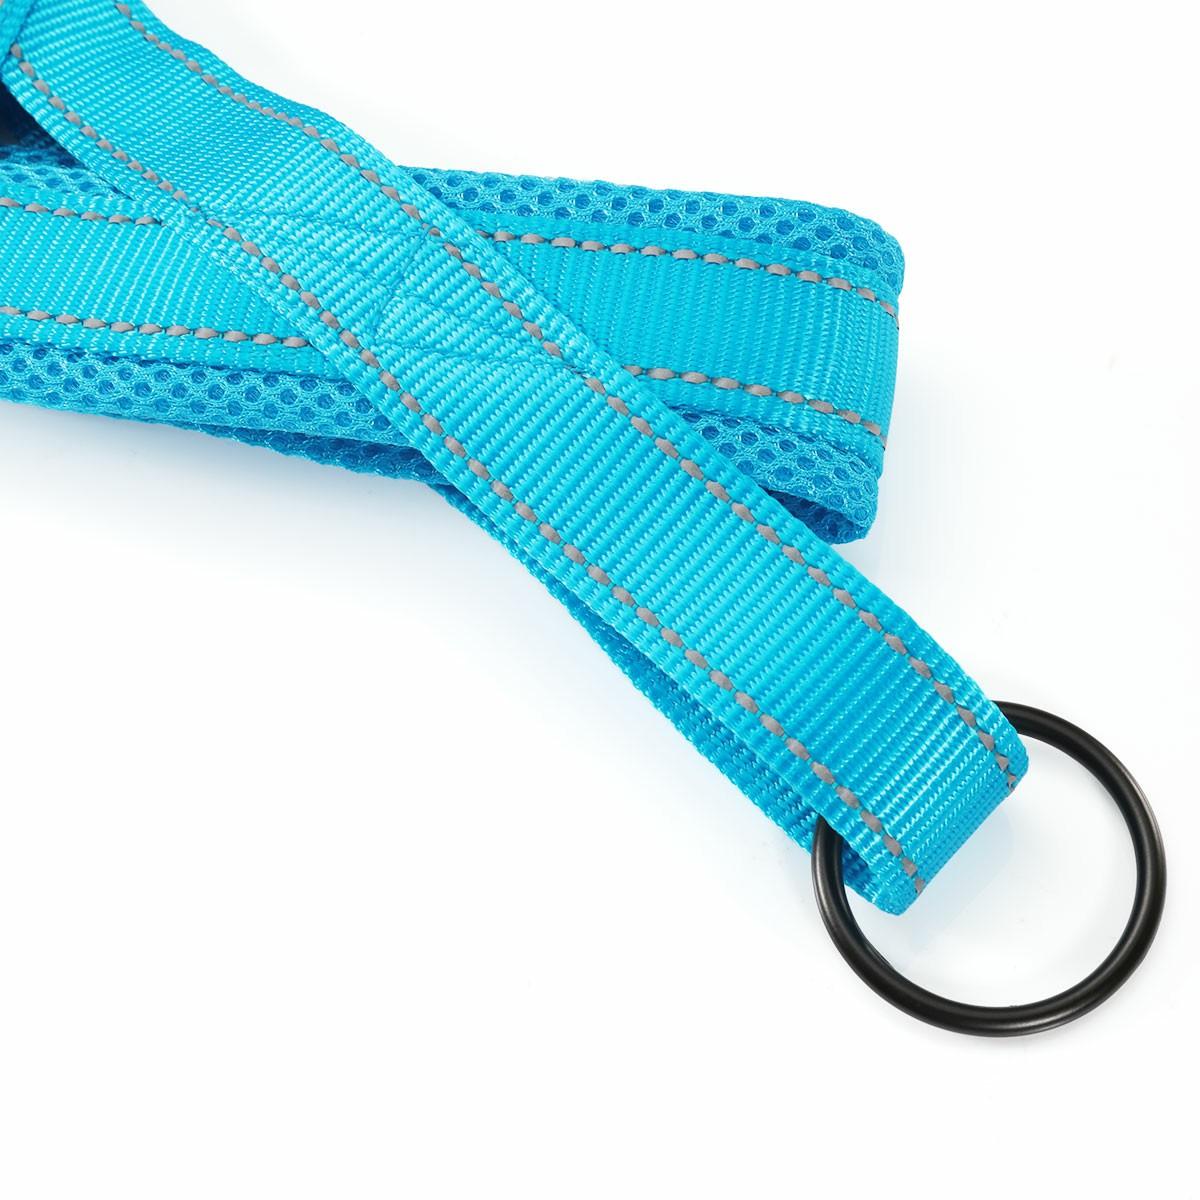 Dog Pet Adjustable Safety Seat Belt Harness Restraint Lead Leash Size XS - Blue